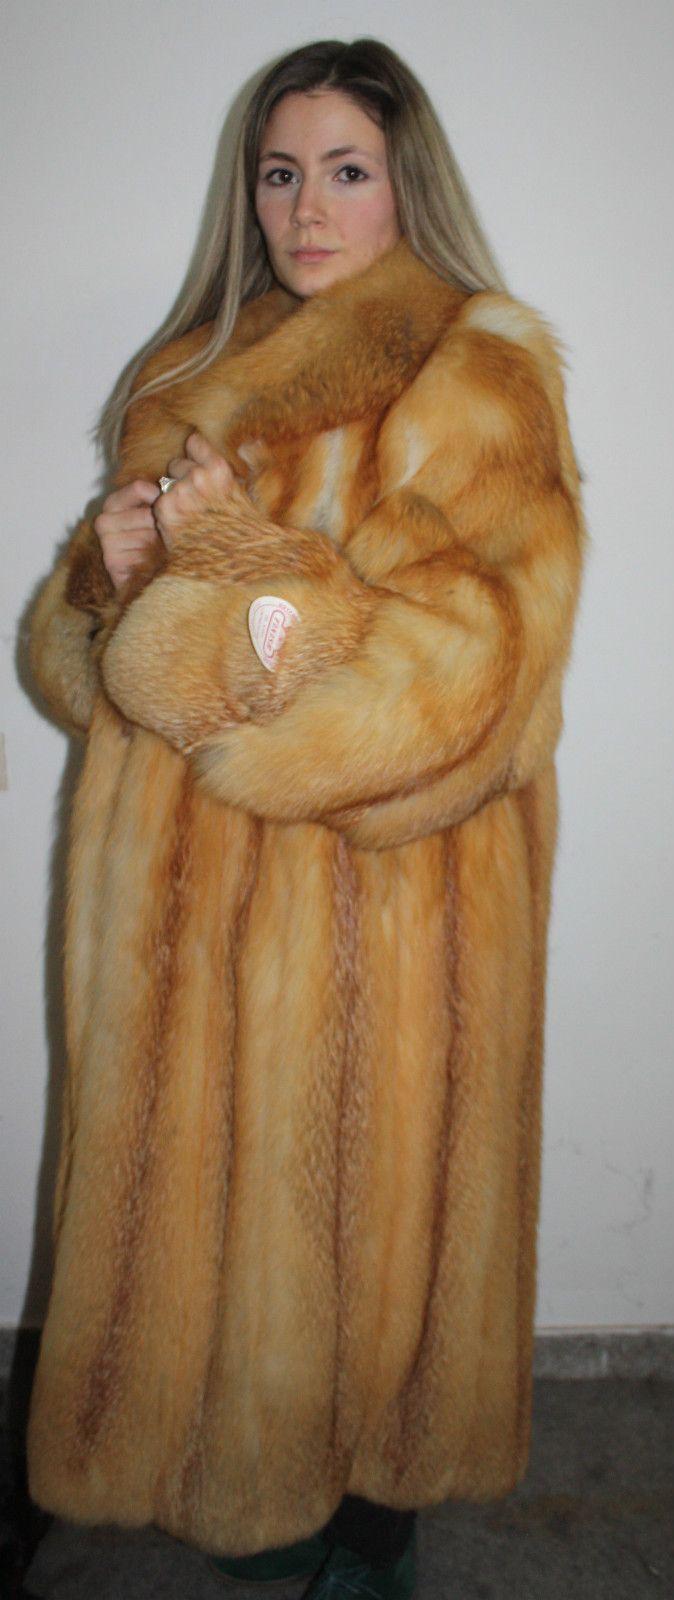 red fox fur coat - Google Search   Regal Red Fox Furs ...